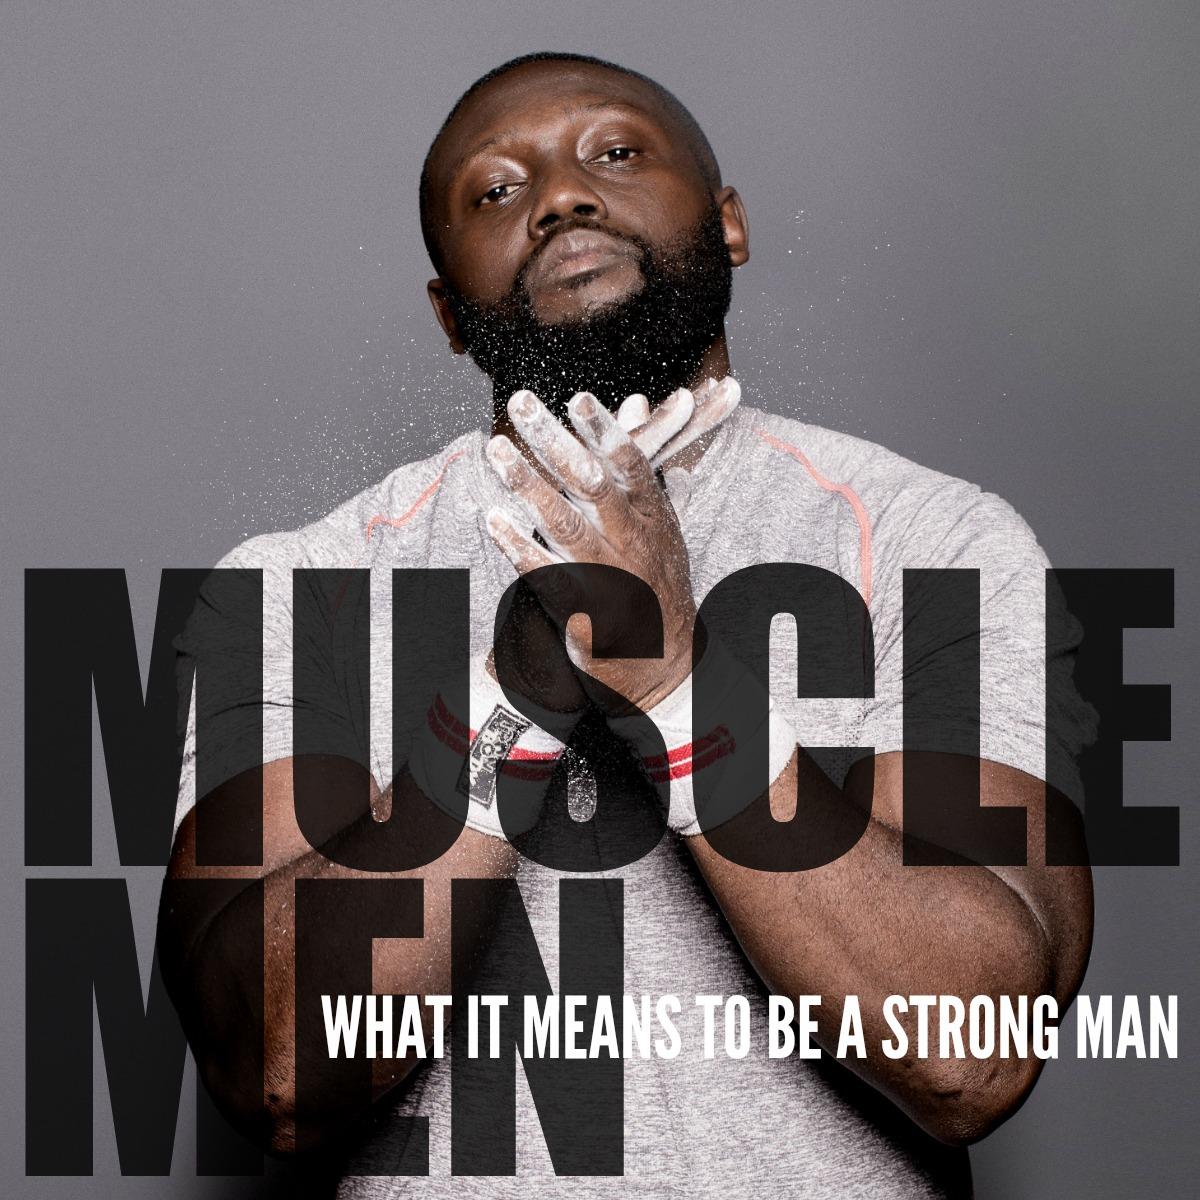 Muscle Men: Week 3